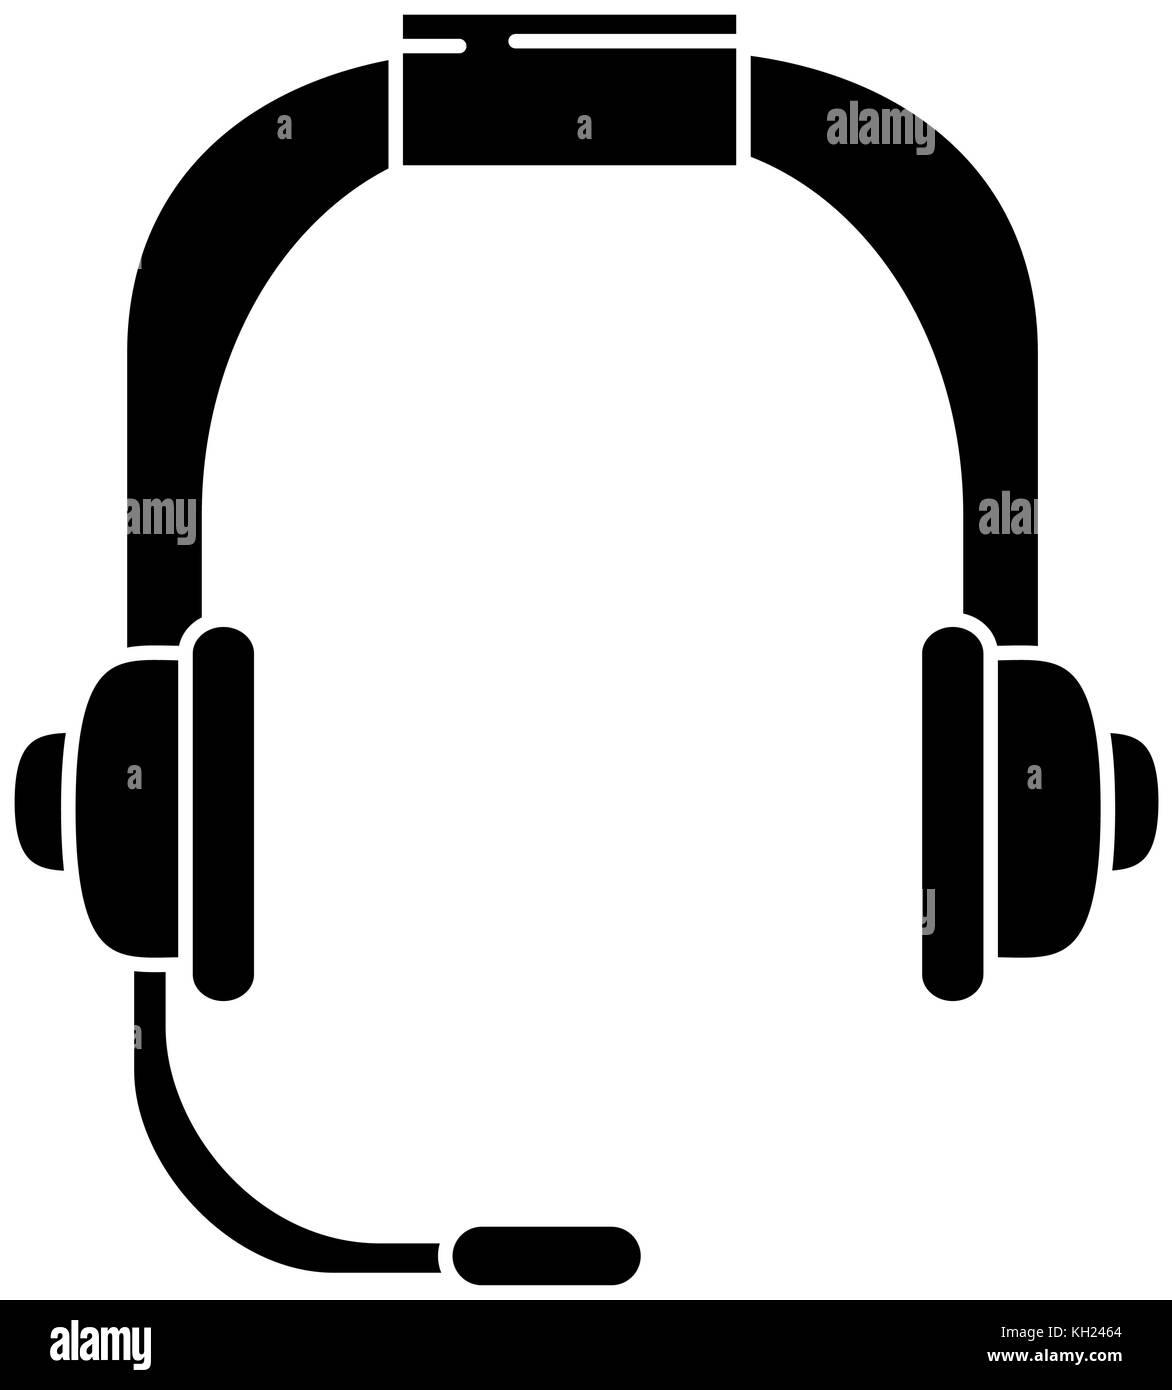 Headphone Symbol Stockfotos & Headphone Symbol Bilder - Alamy